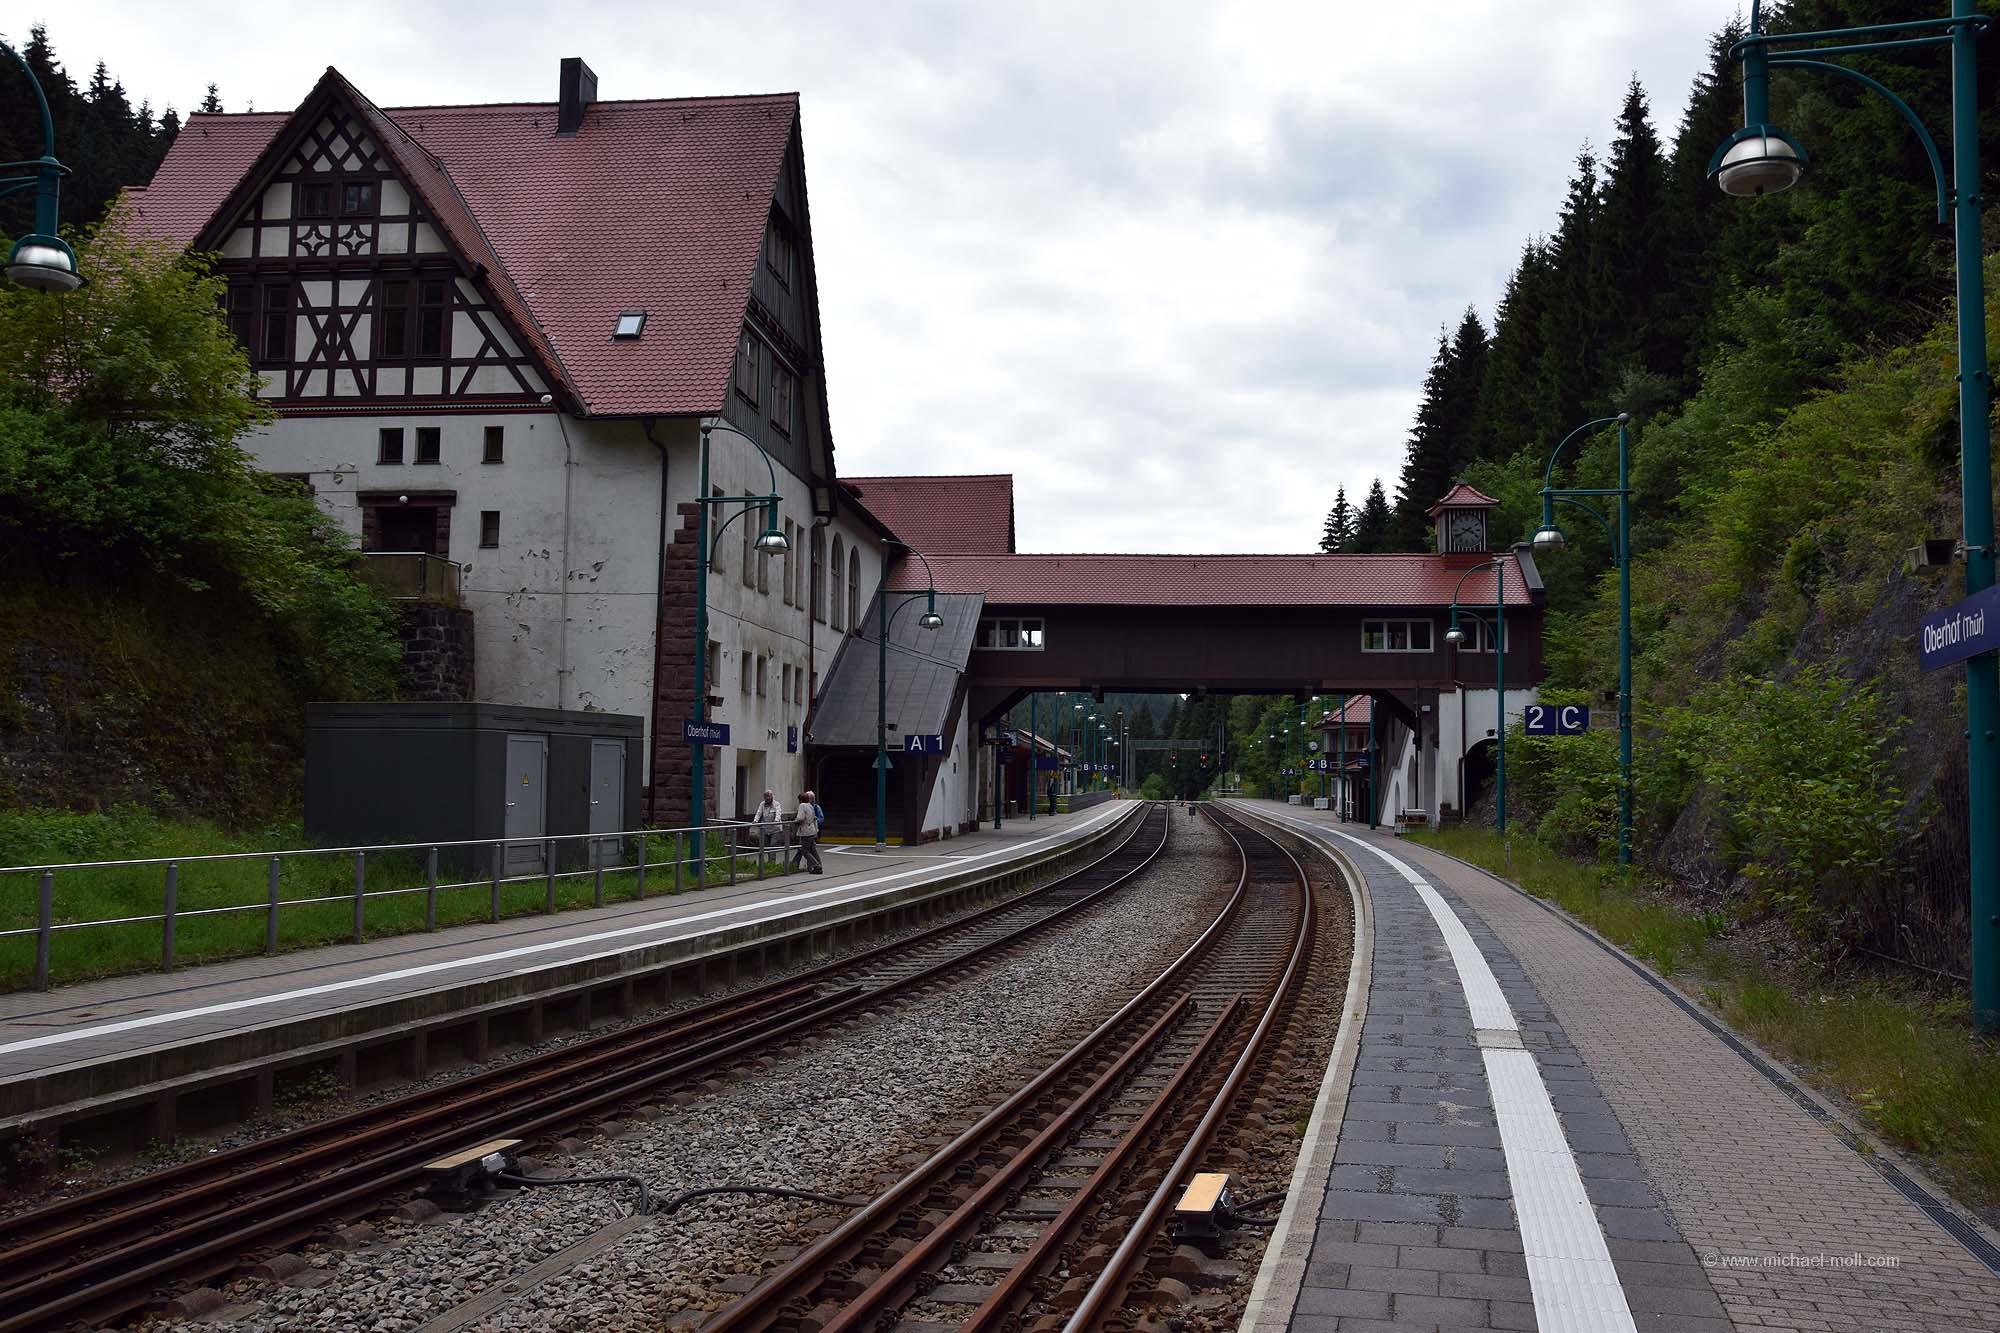 Bahnhof Oberhof